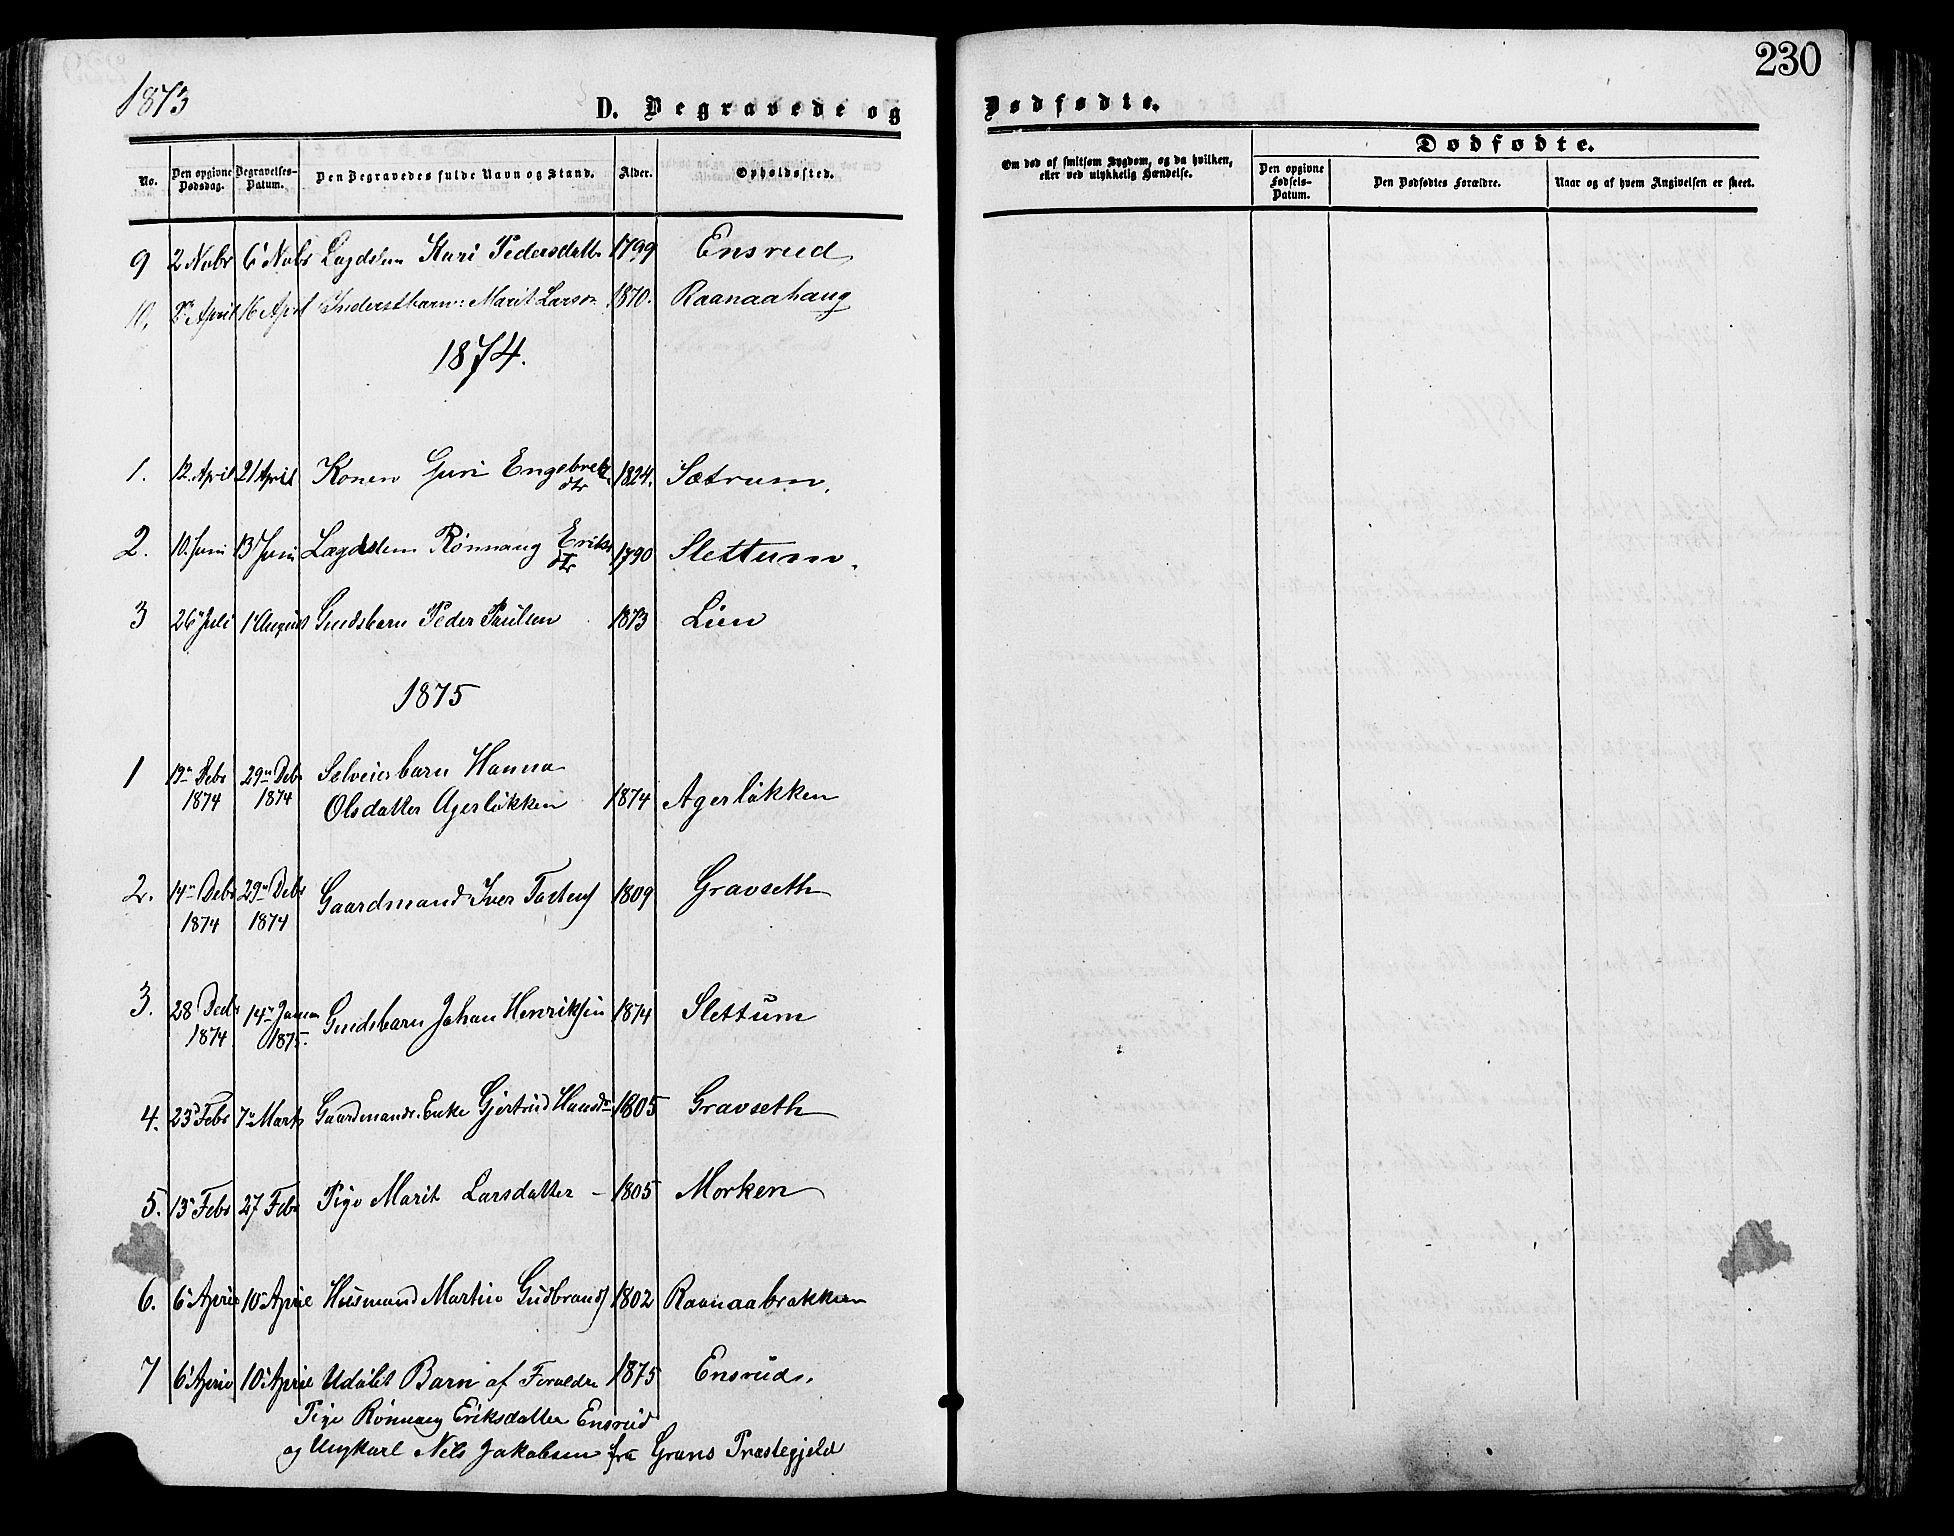 SAH, Lesja prestekontor, Ministerialbok nr. 9, 1854-1889, s. 230